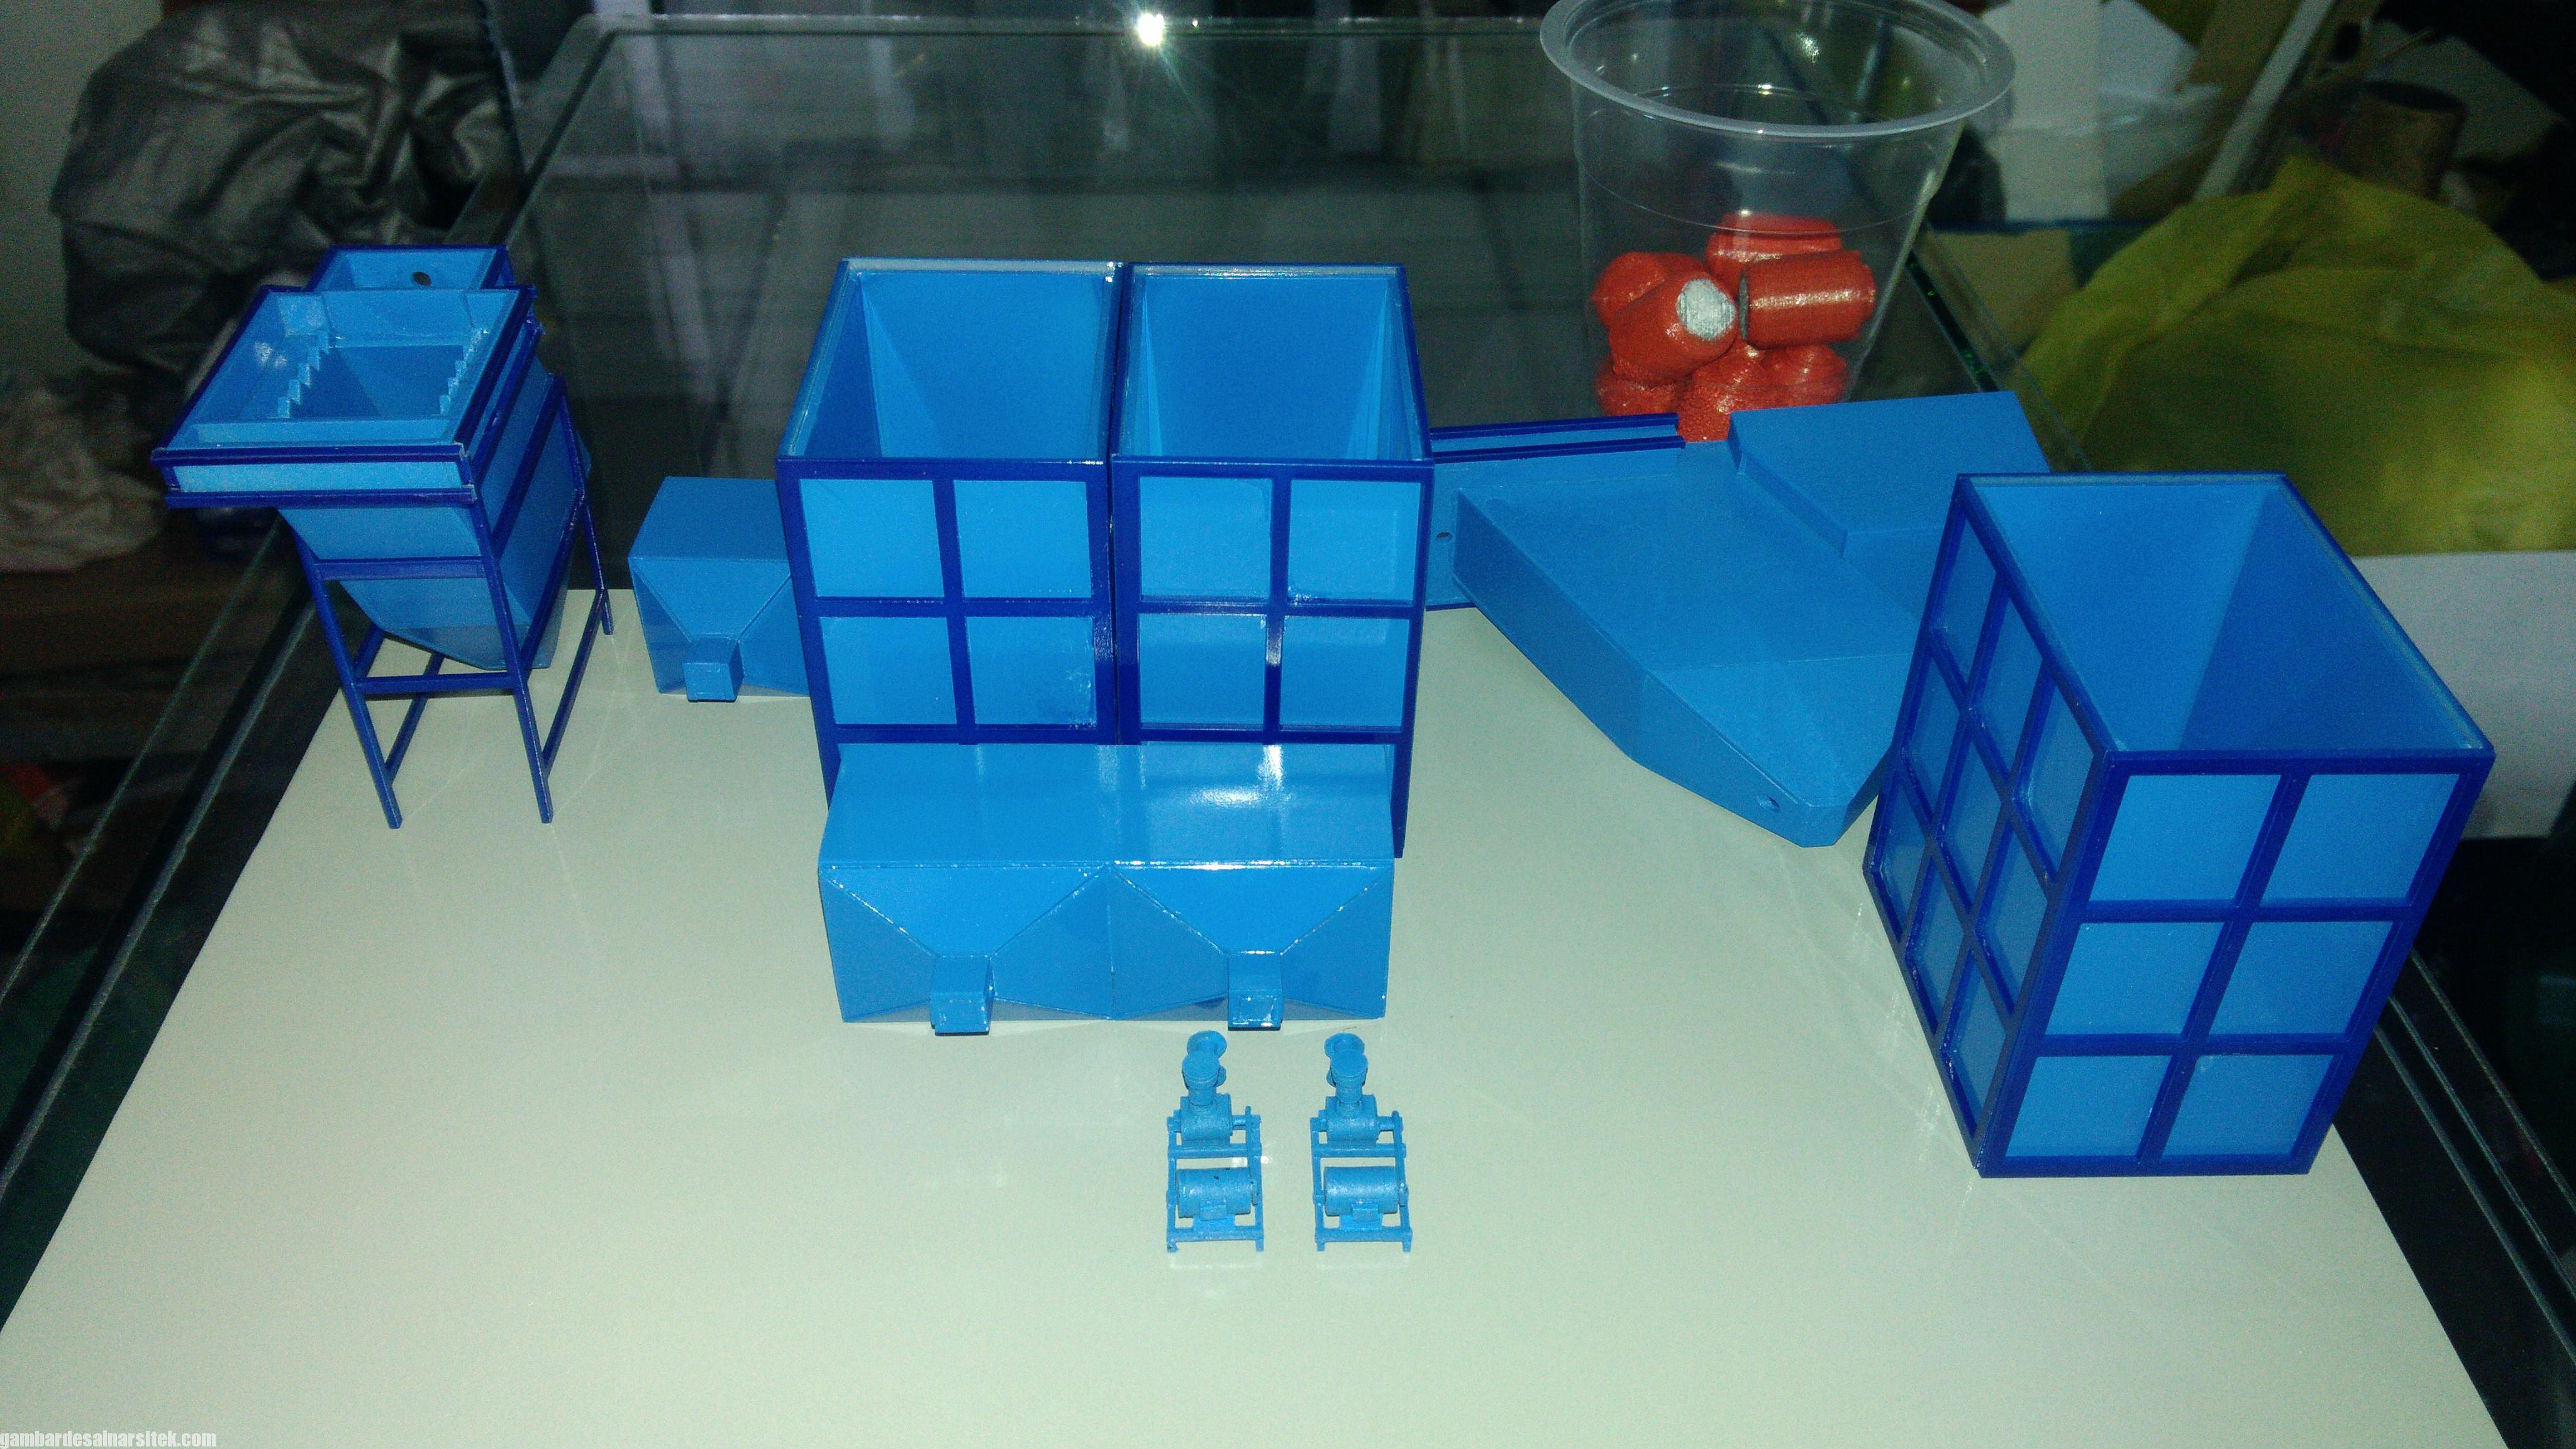 Maket Arsitektur Miniatur Model 36 Permesinan Pengolahan Limbah (12)